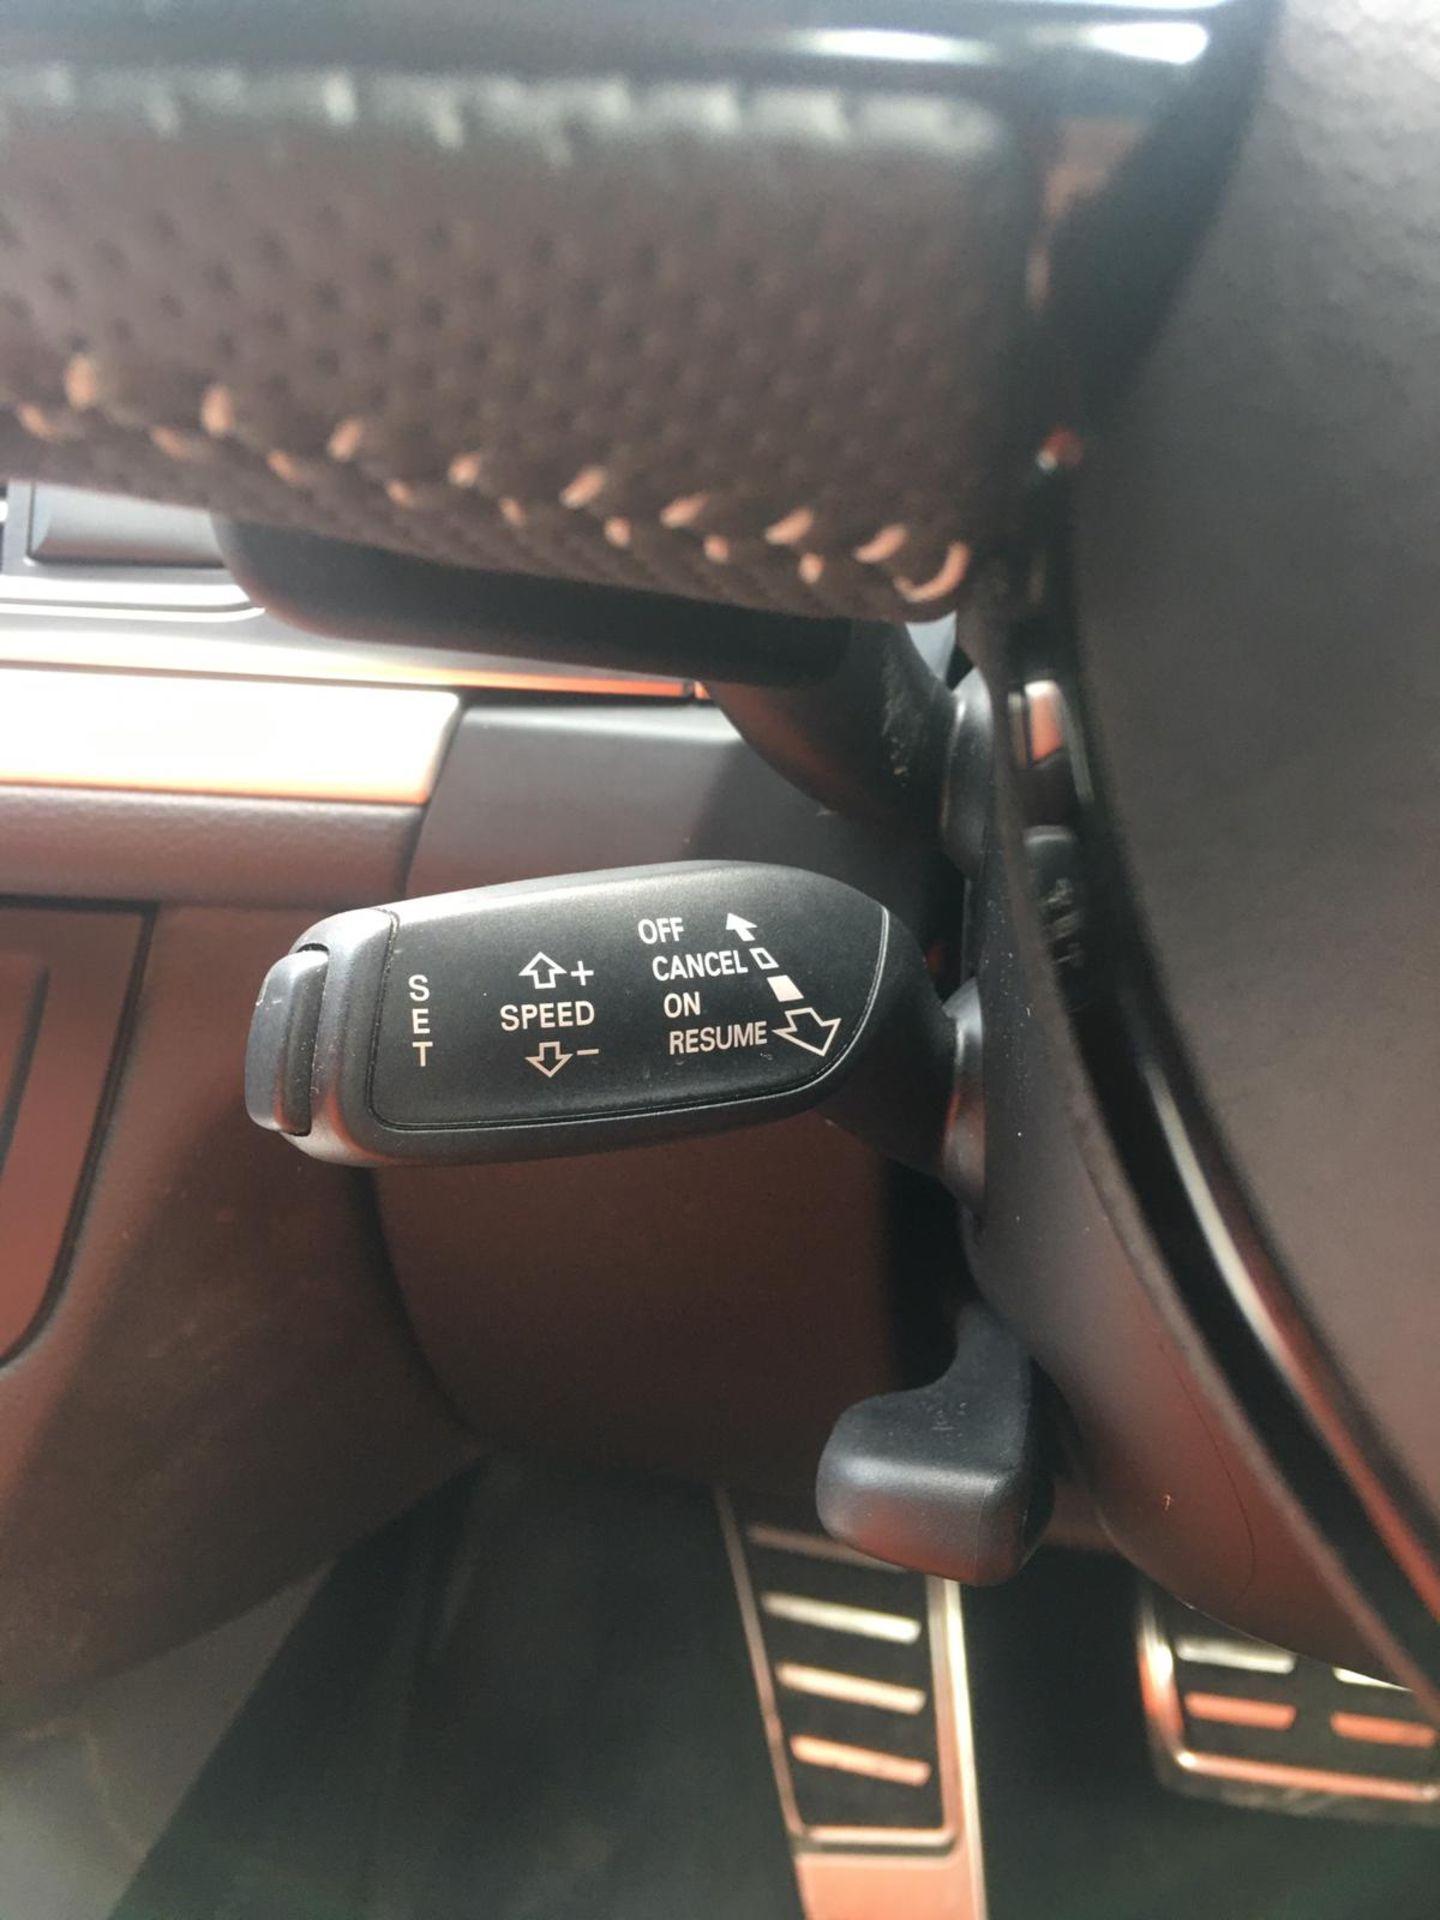 2018/18 REG AUDI A6 S LINE TDI ULTRA SEMI-AUTO 2.0 DIESEL ESTATE, SHOWING 1 FORMER KEEPER *NO VAT* - Image 24 of 33